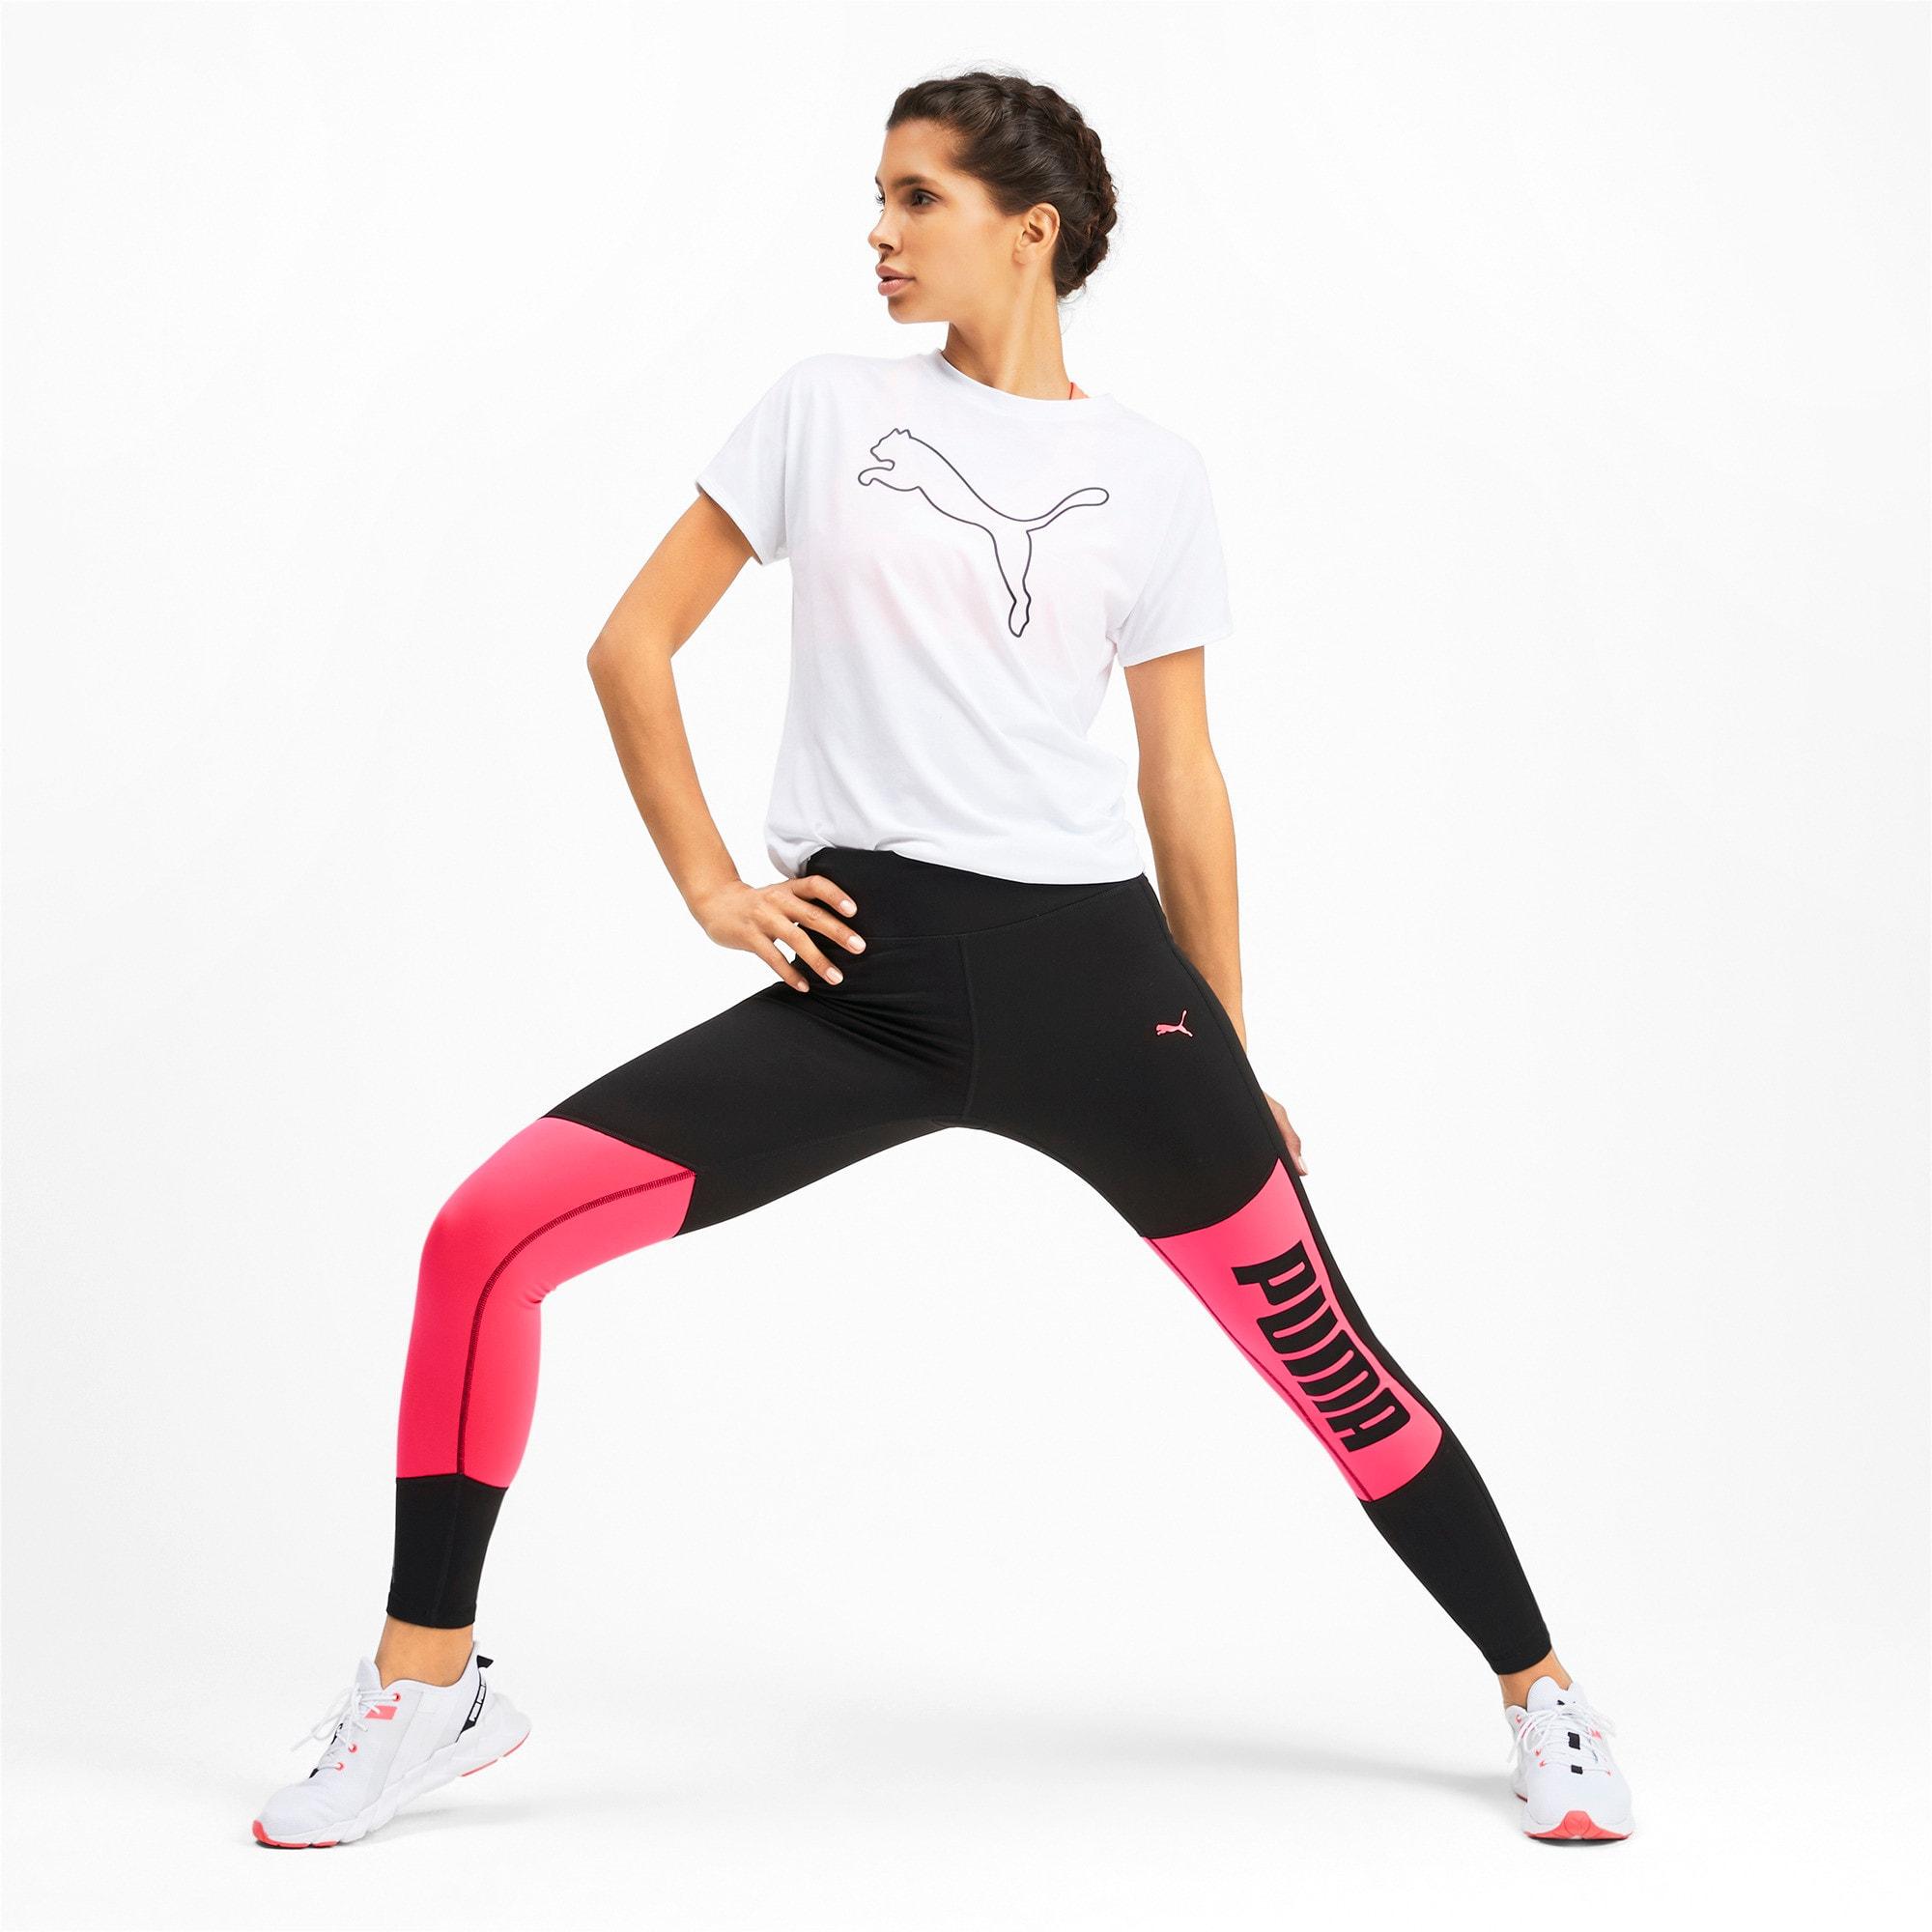 Thumbnail 3 of Logo 7/8 Graphic Women's Training Leggings, Puma Black-Pink Alert, medium-IND